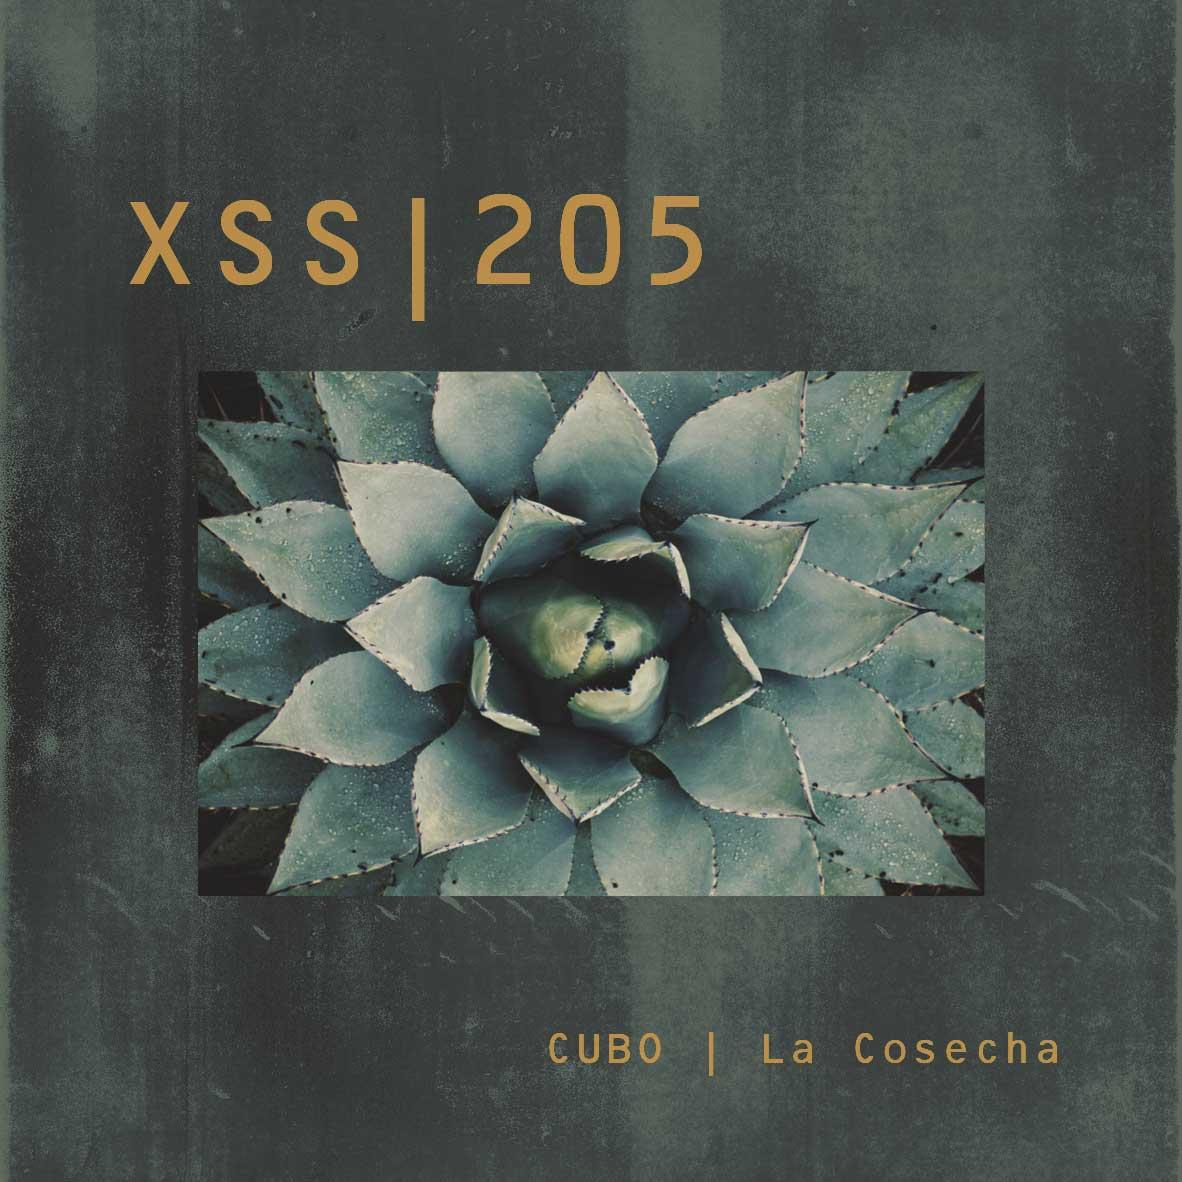 XSS205 | Cubo | La Cosecha